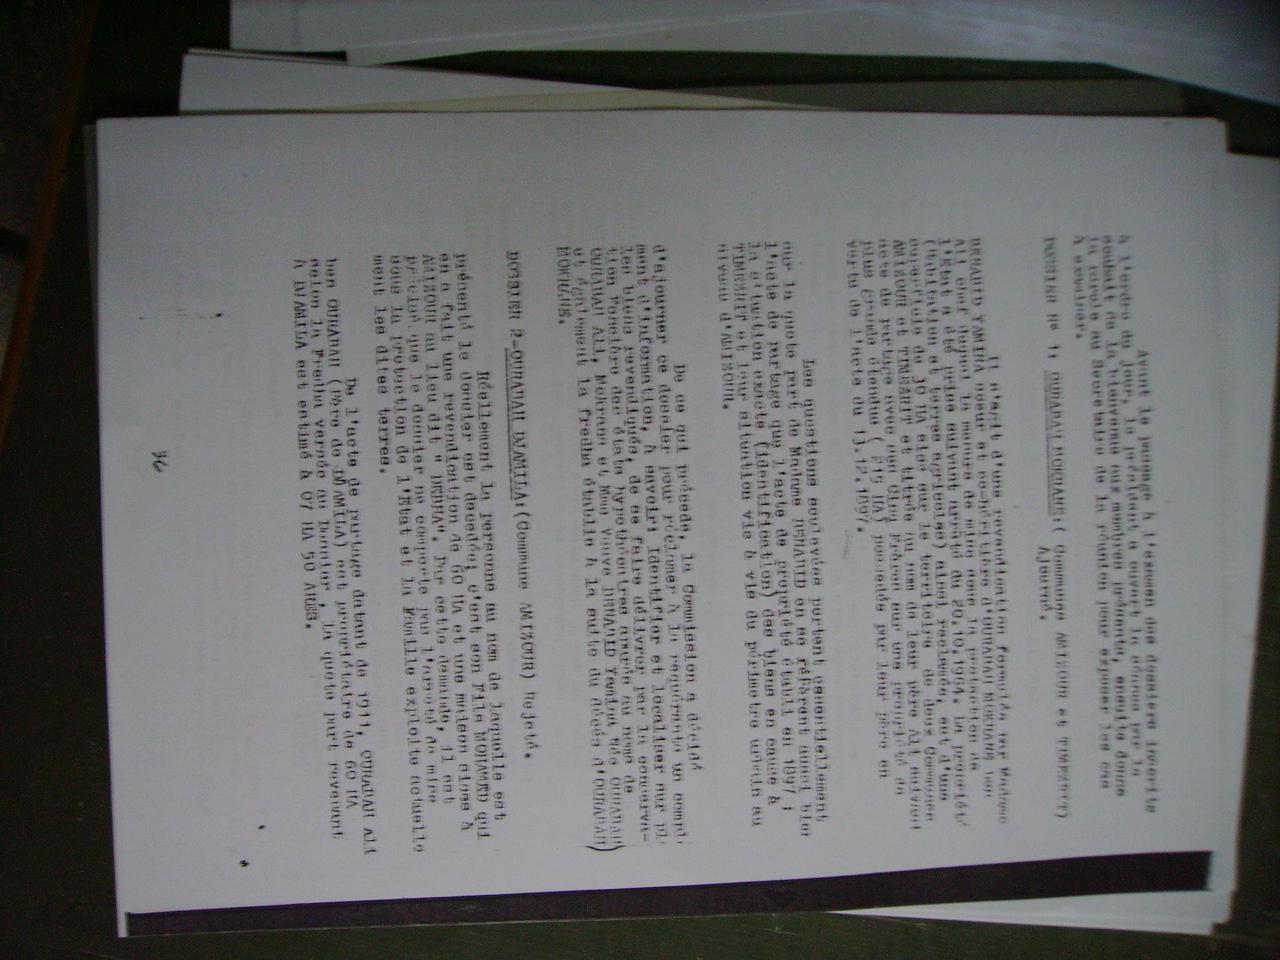 pvrunioncommissionrestitution10mai1997p3.jpg